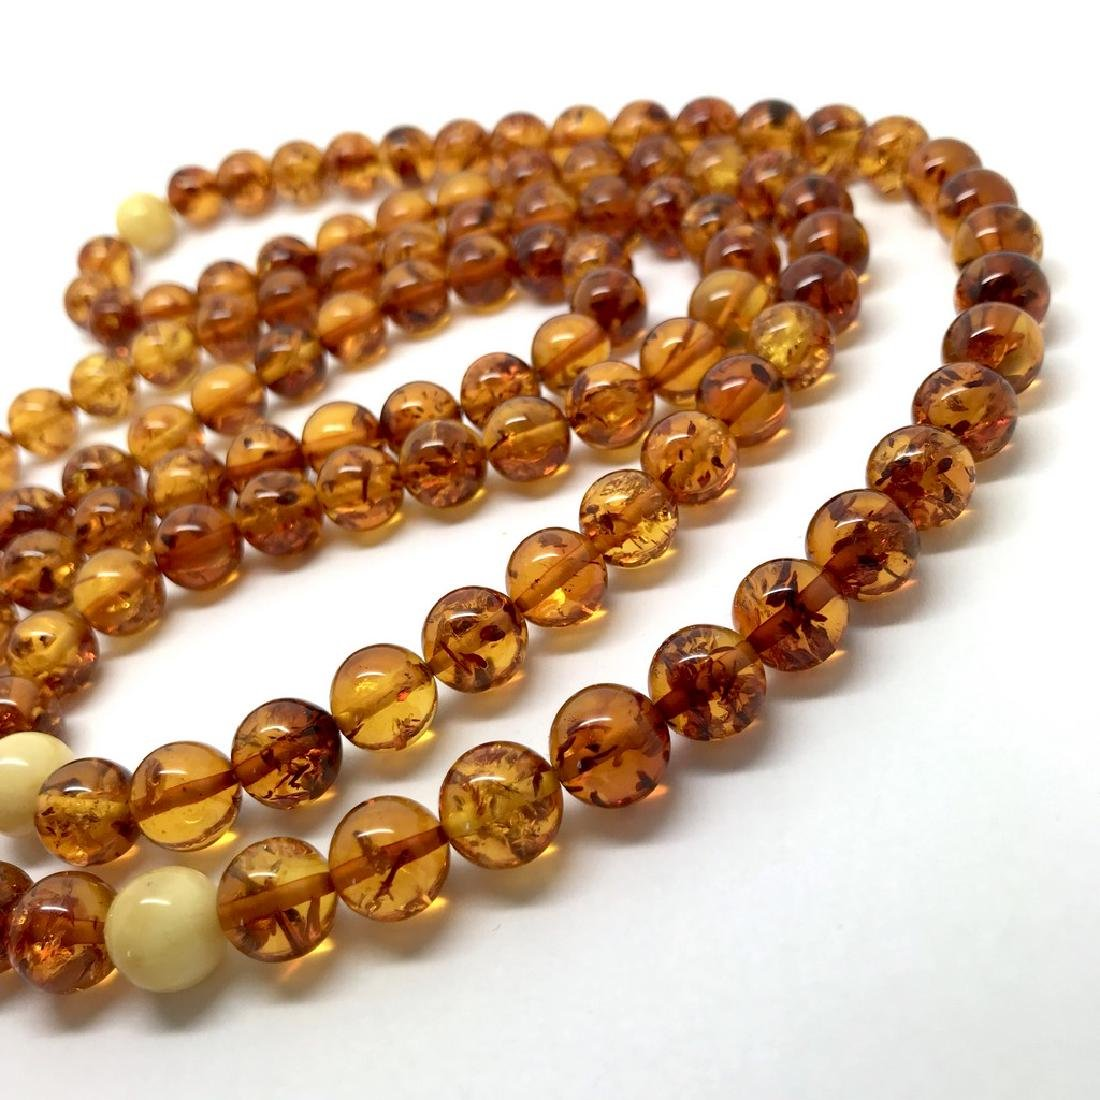 Japa mala necklace Baltic amber cognac beads ø9mm 52 - 6